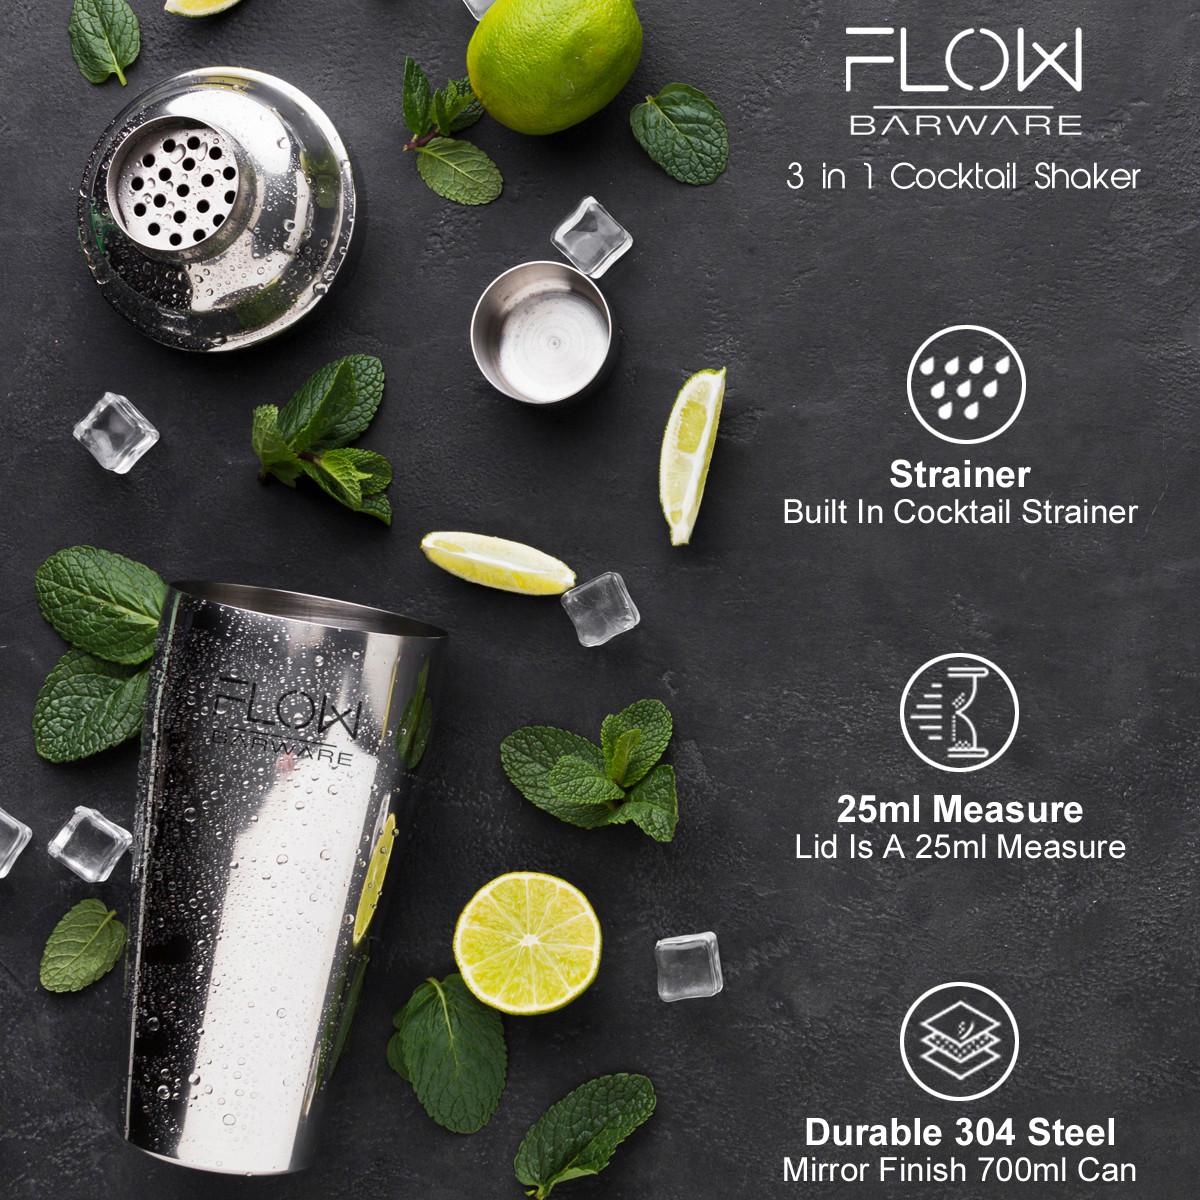 FLOW Cocktail Shaker